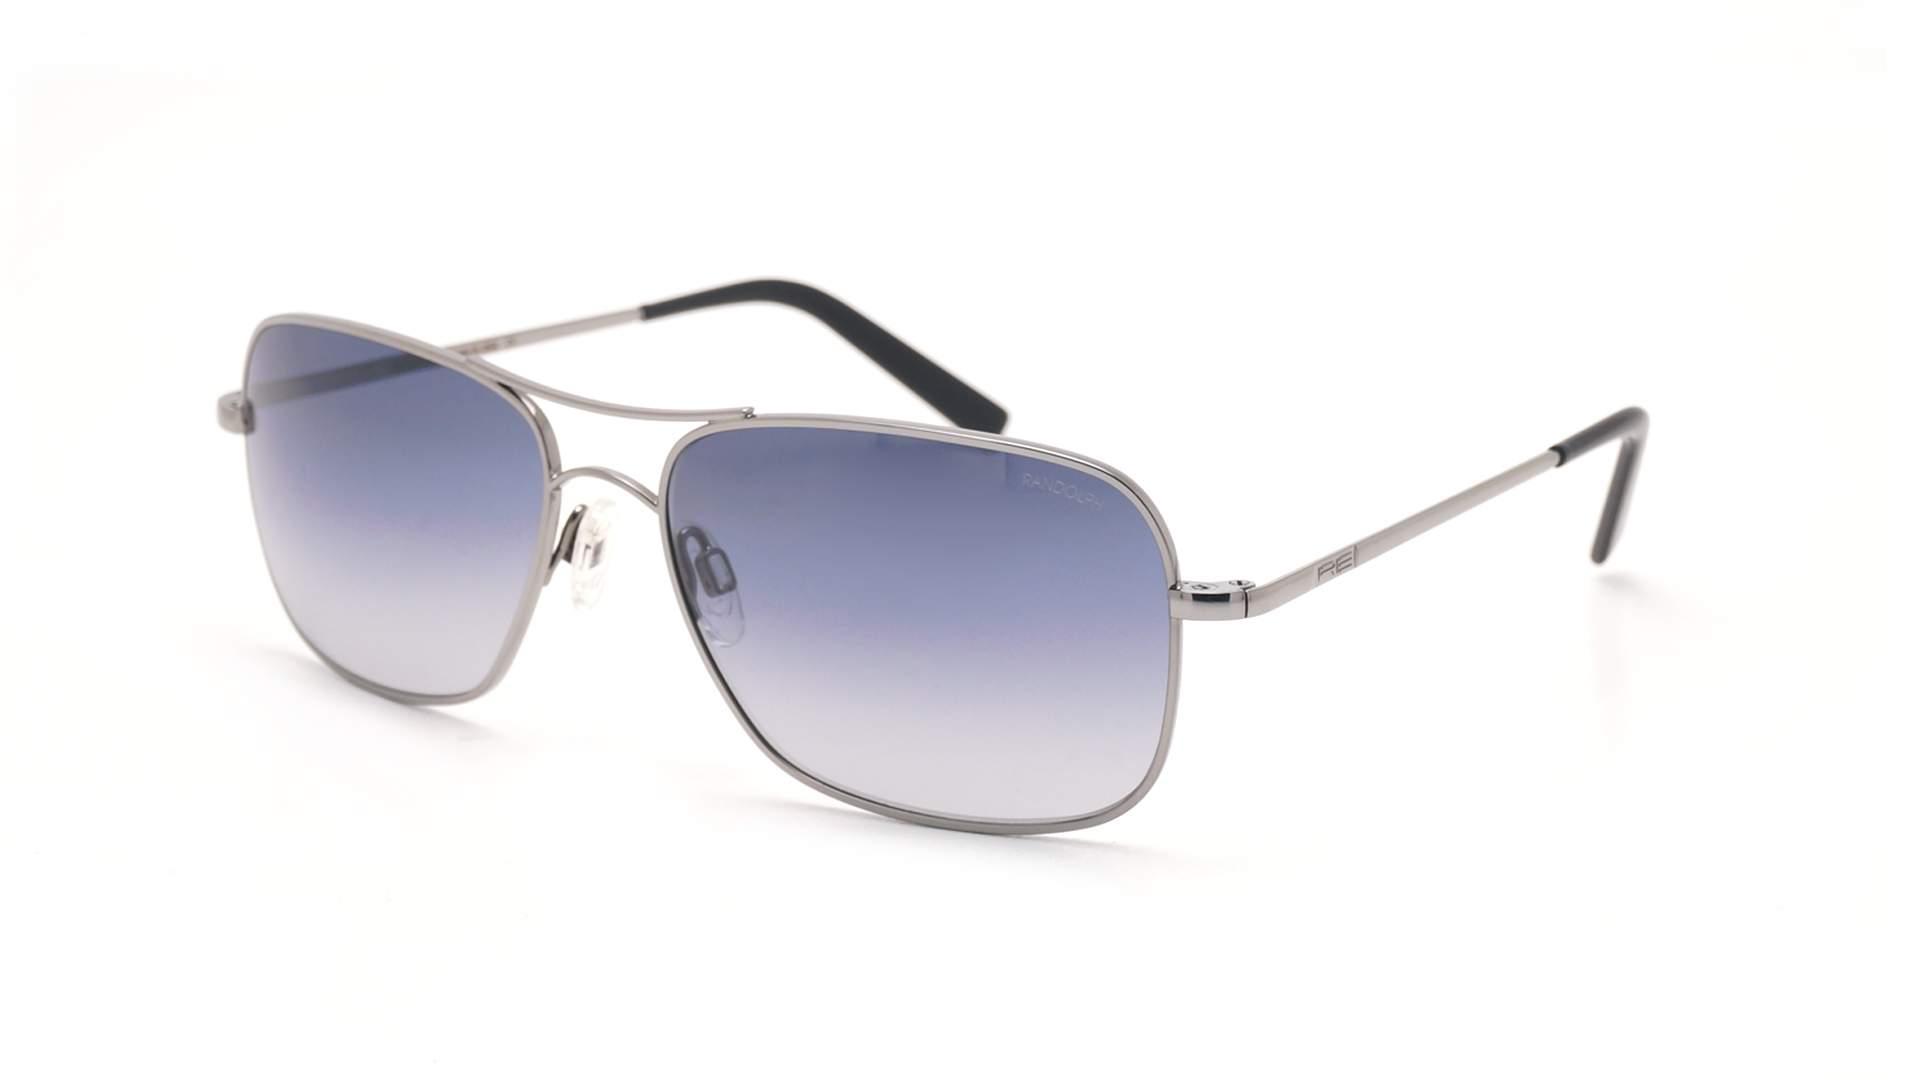 f59d9c8186d Sunglasses Randolph Archer Grey AR004 59-16 Large Gradient